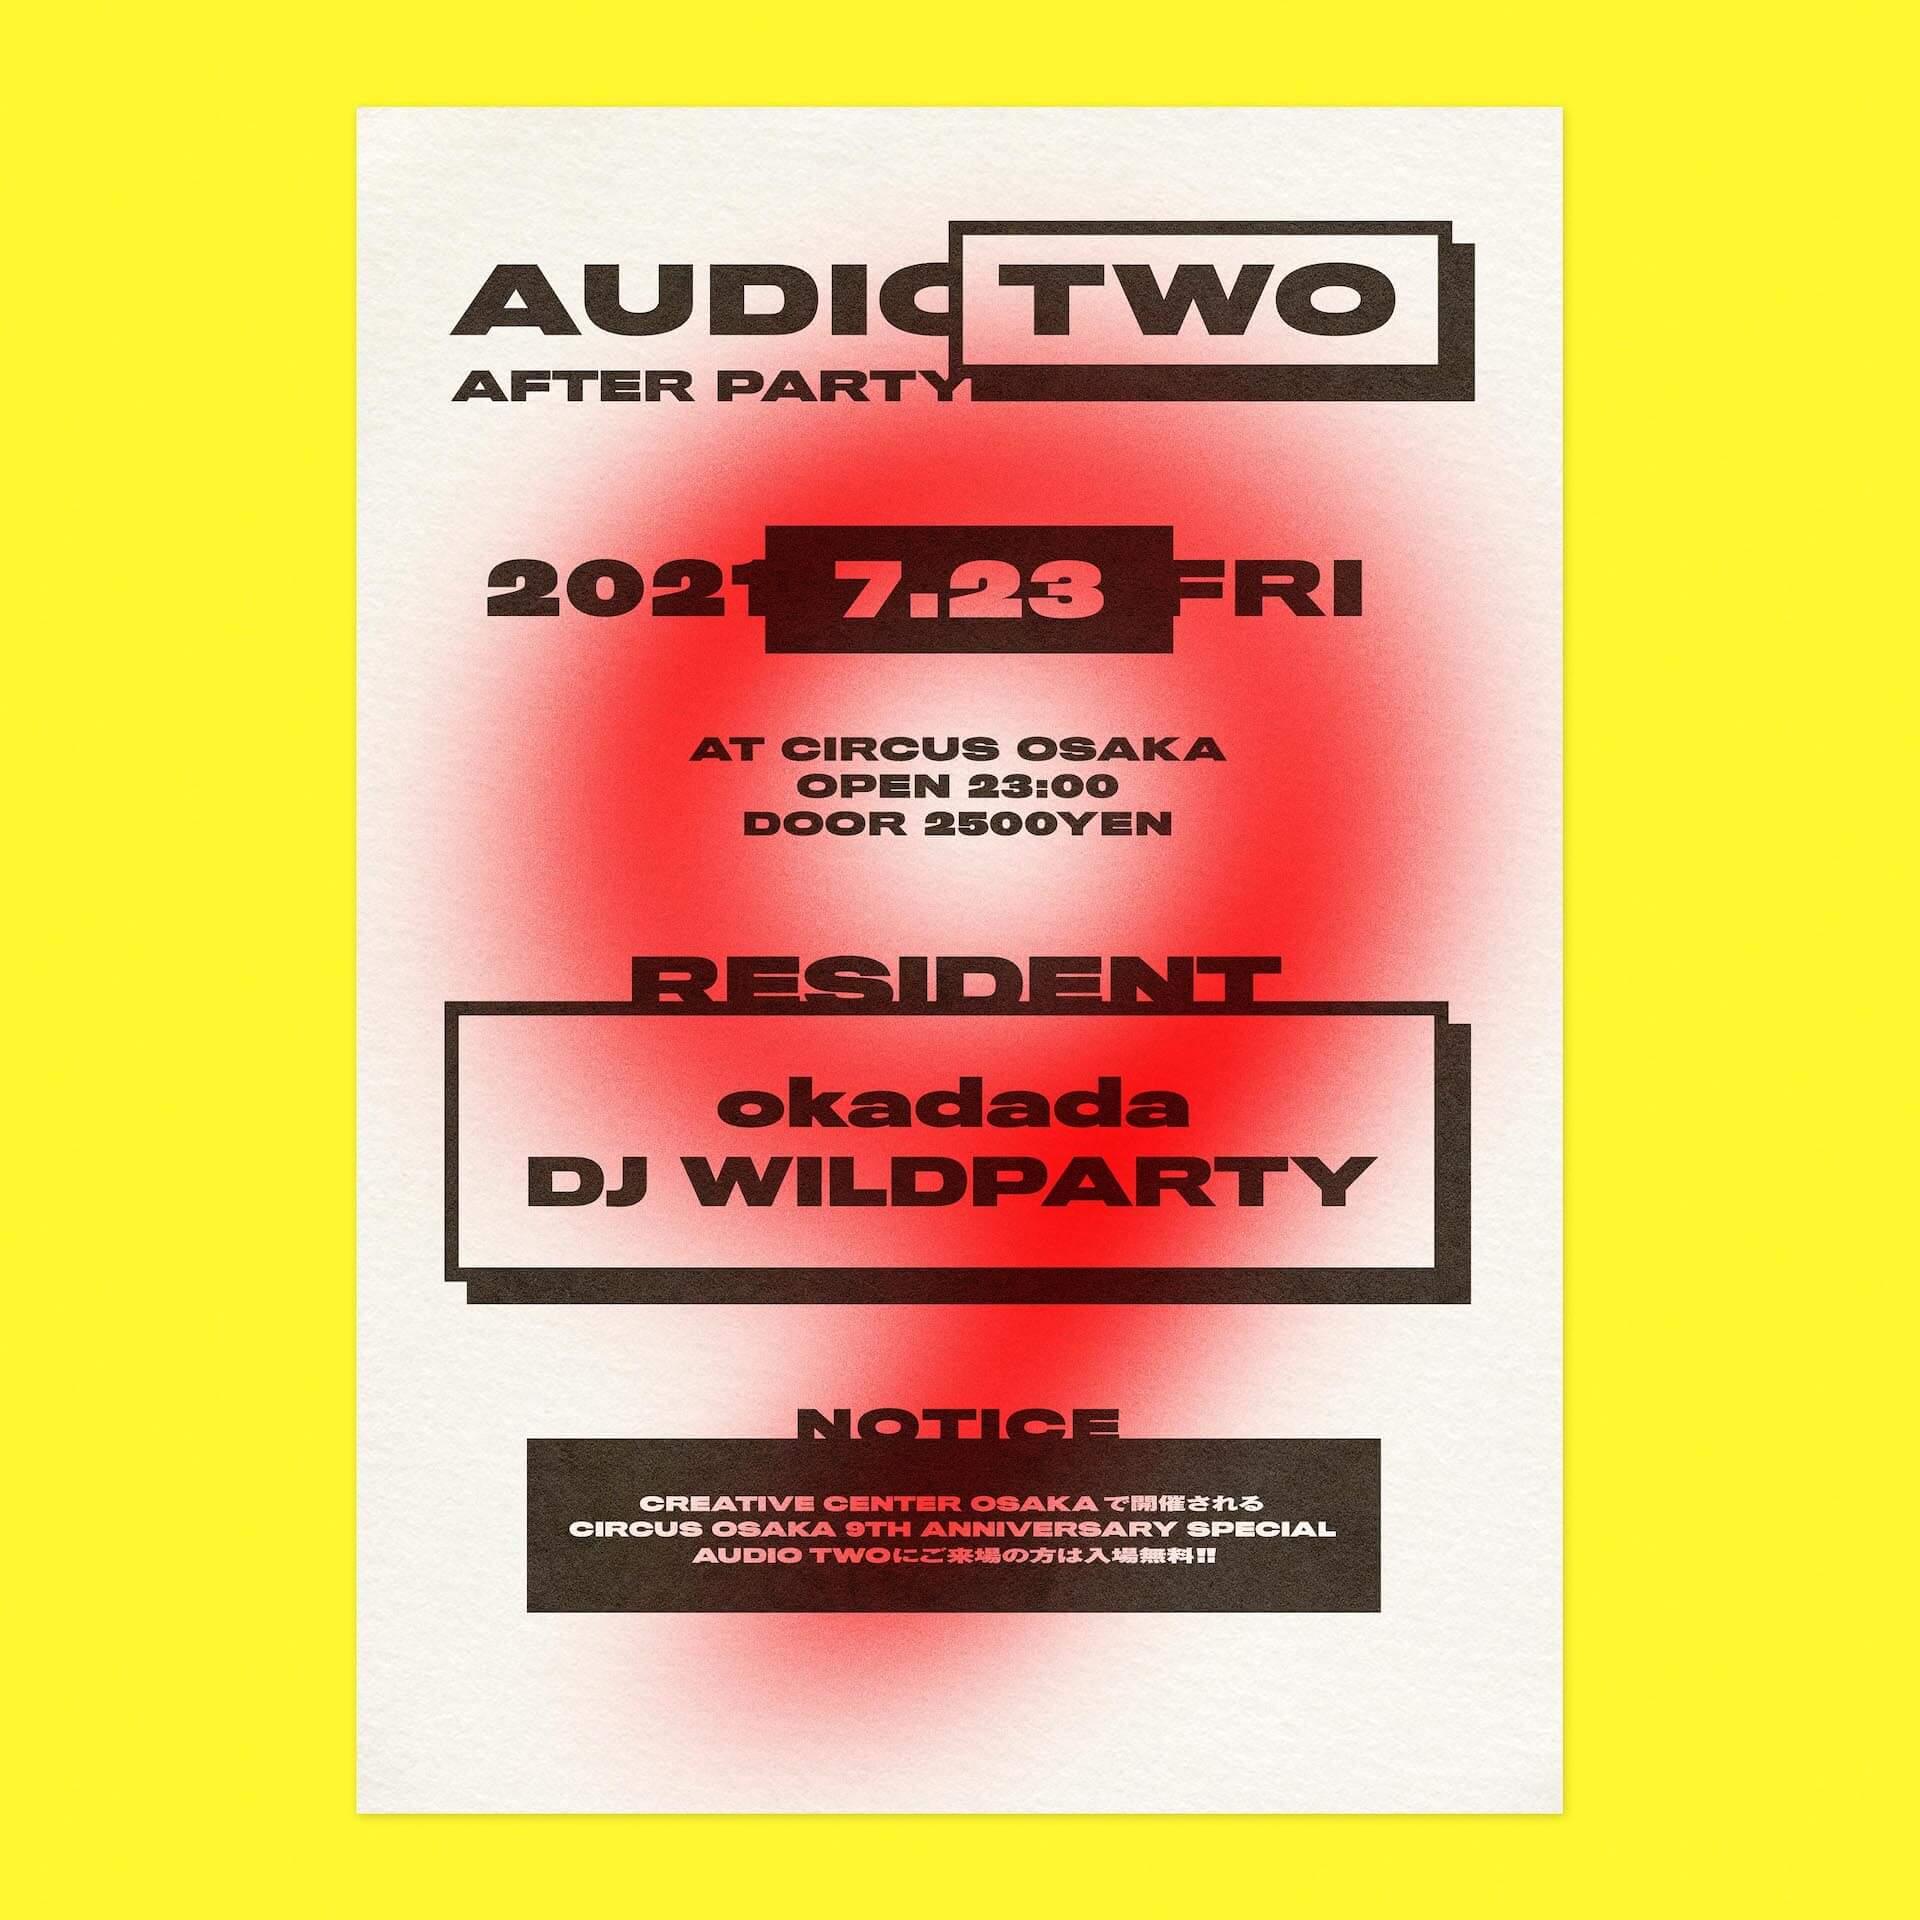 CIRCUS OSAKA9周年番外編<AUDIO TWO>のタイムテーブル&アフターパーティーが発表! music210720_circusosaka_audiotwo_3